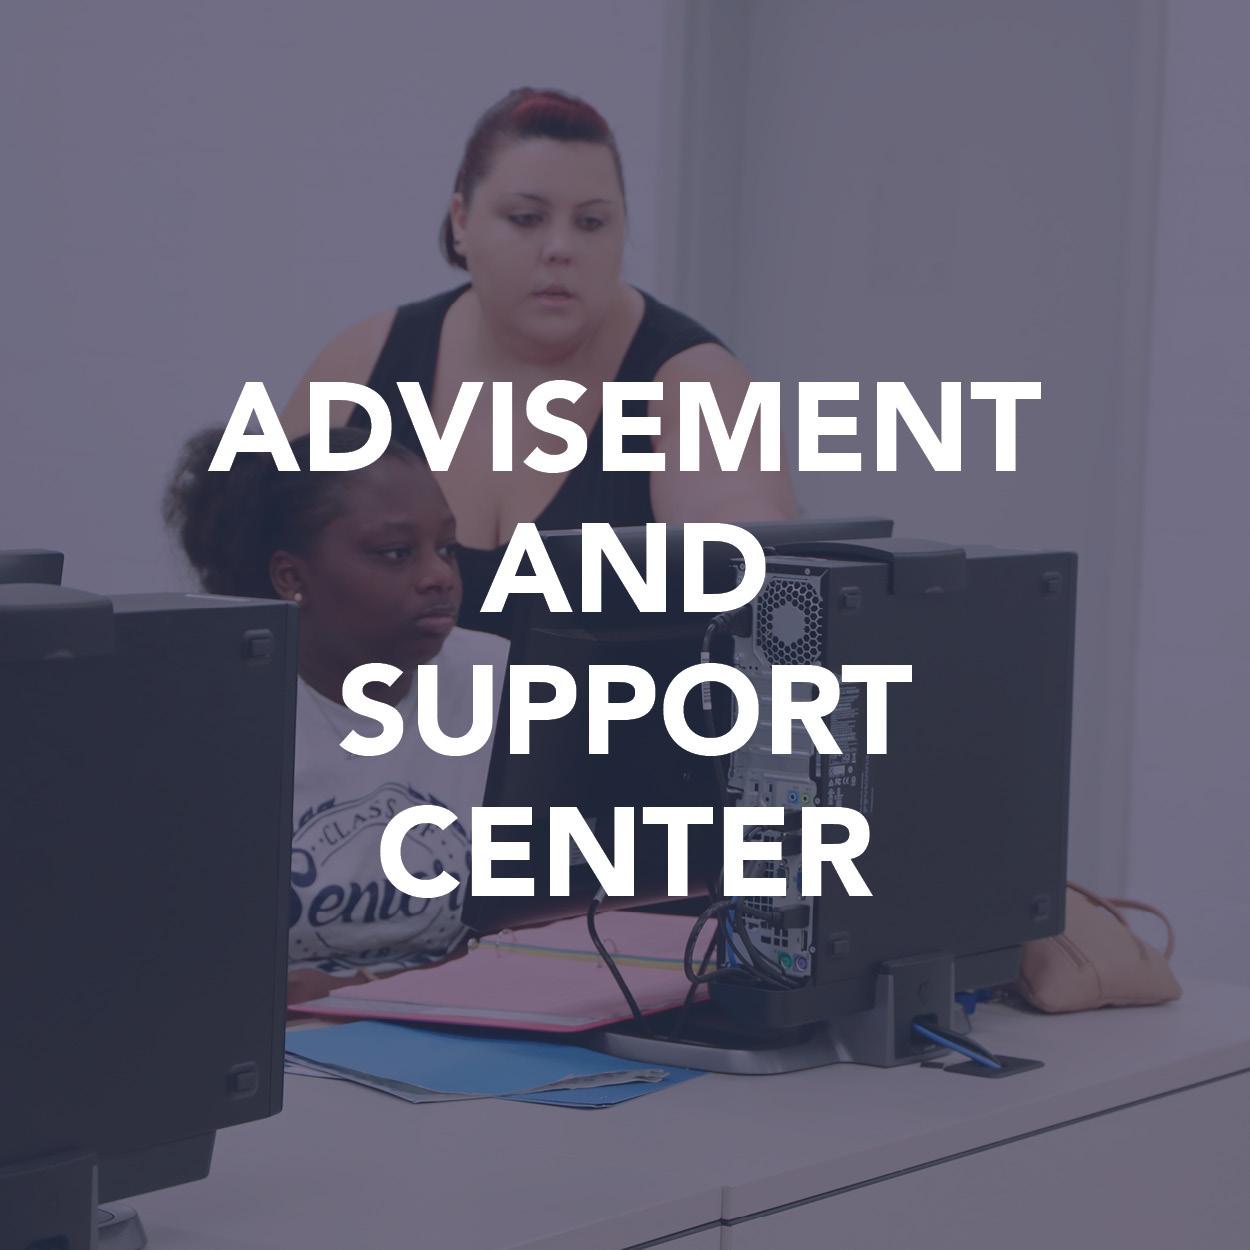 Advisement & Support Center